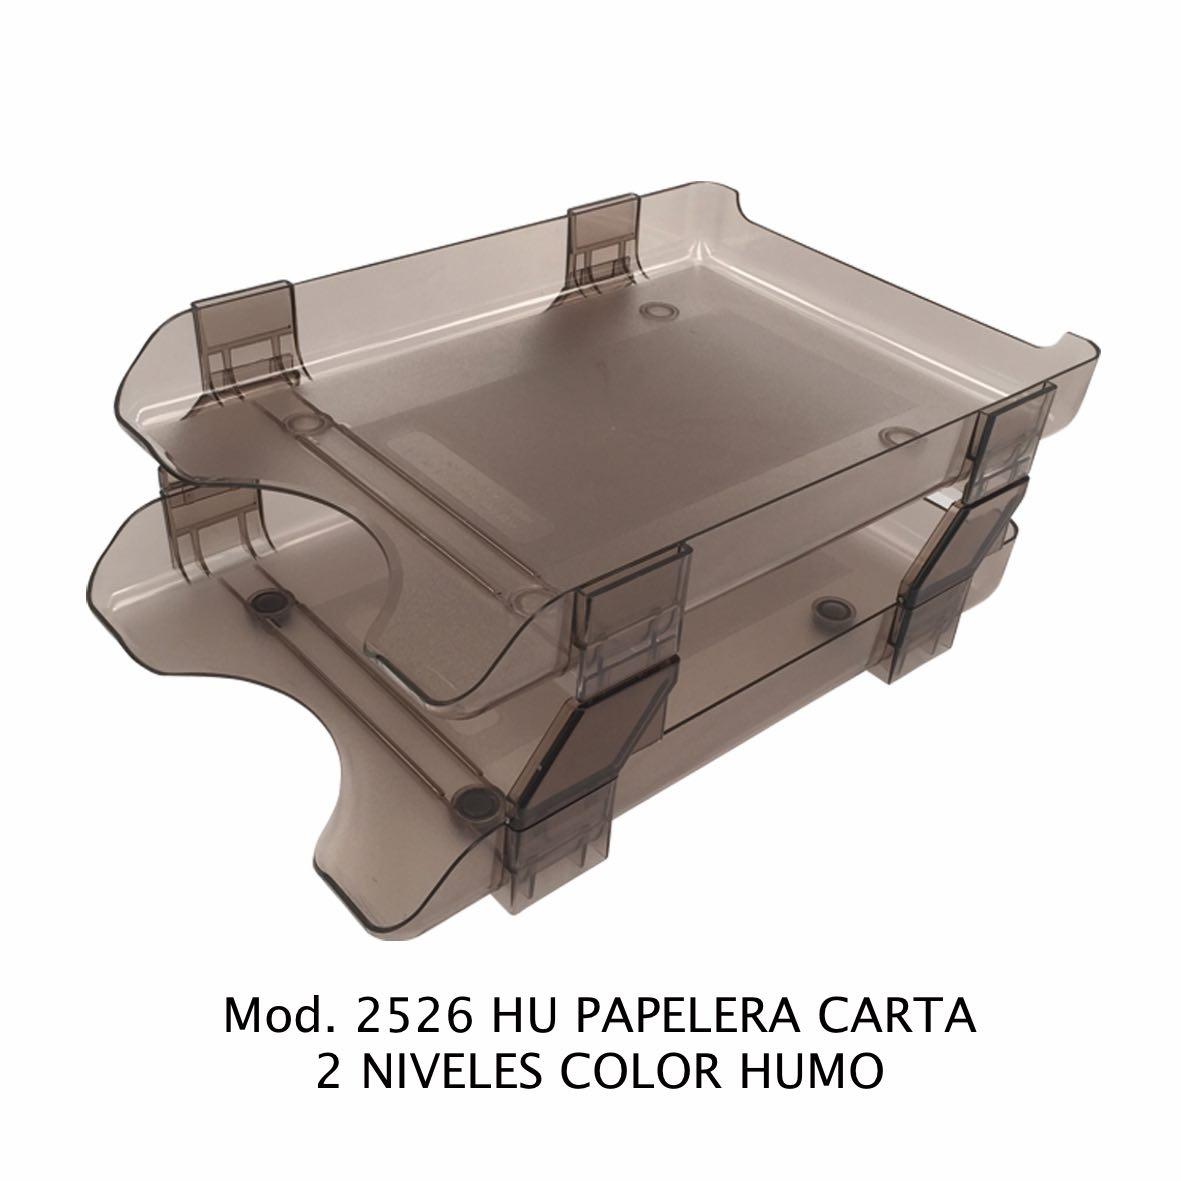 Charola papelera color humo tamaño carta de 2 niveles Modelo 2526 HU - Sablón